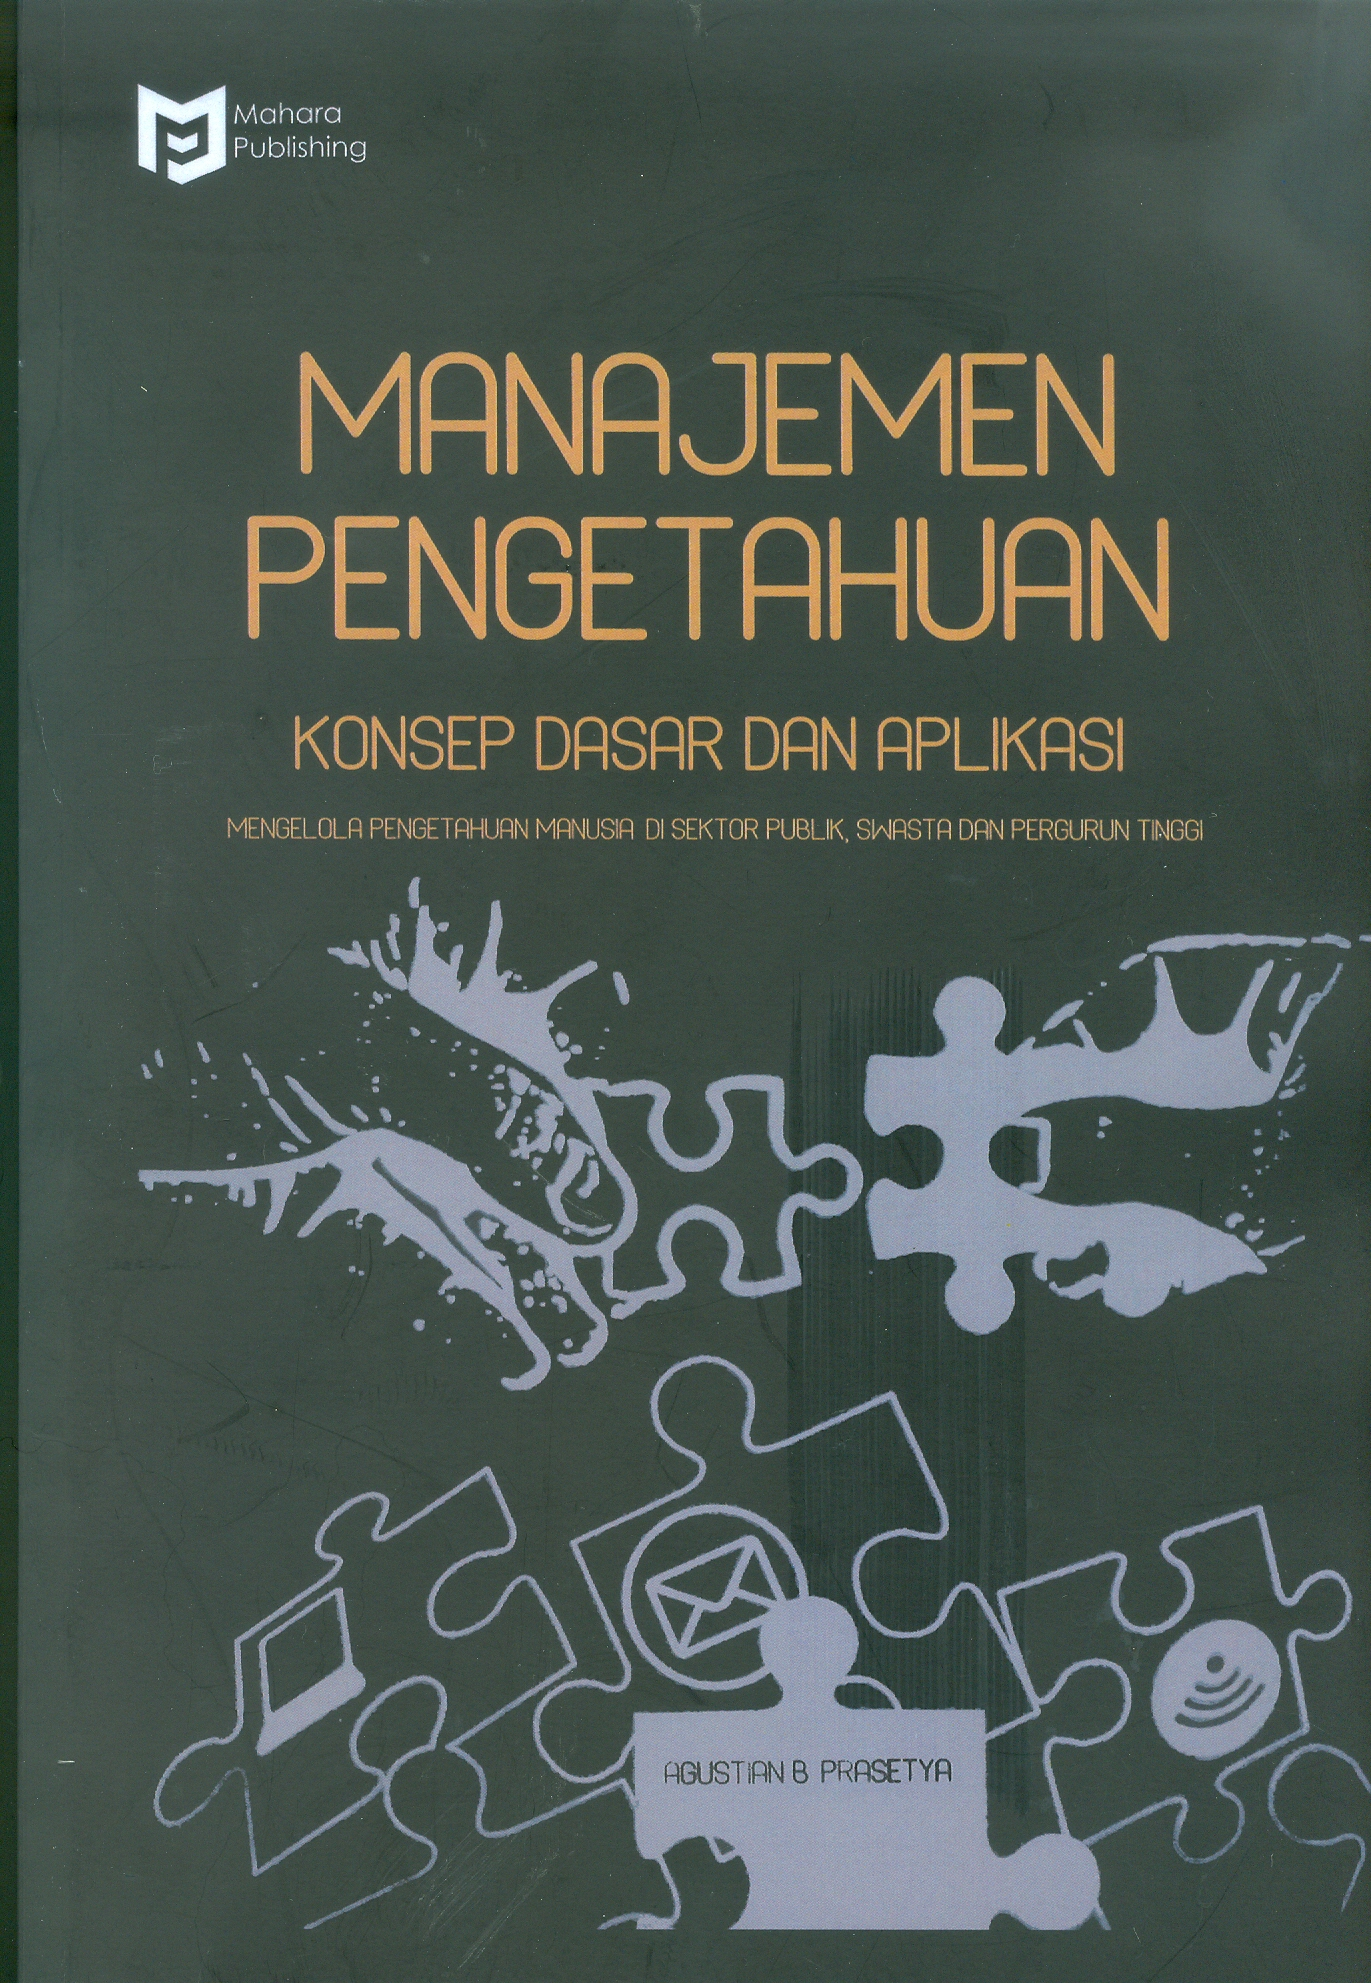 manajemen pengetahuan0001.jpg